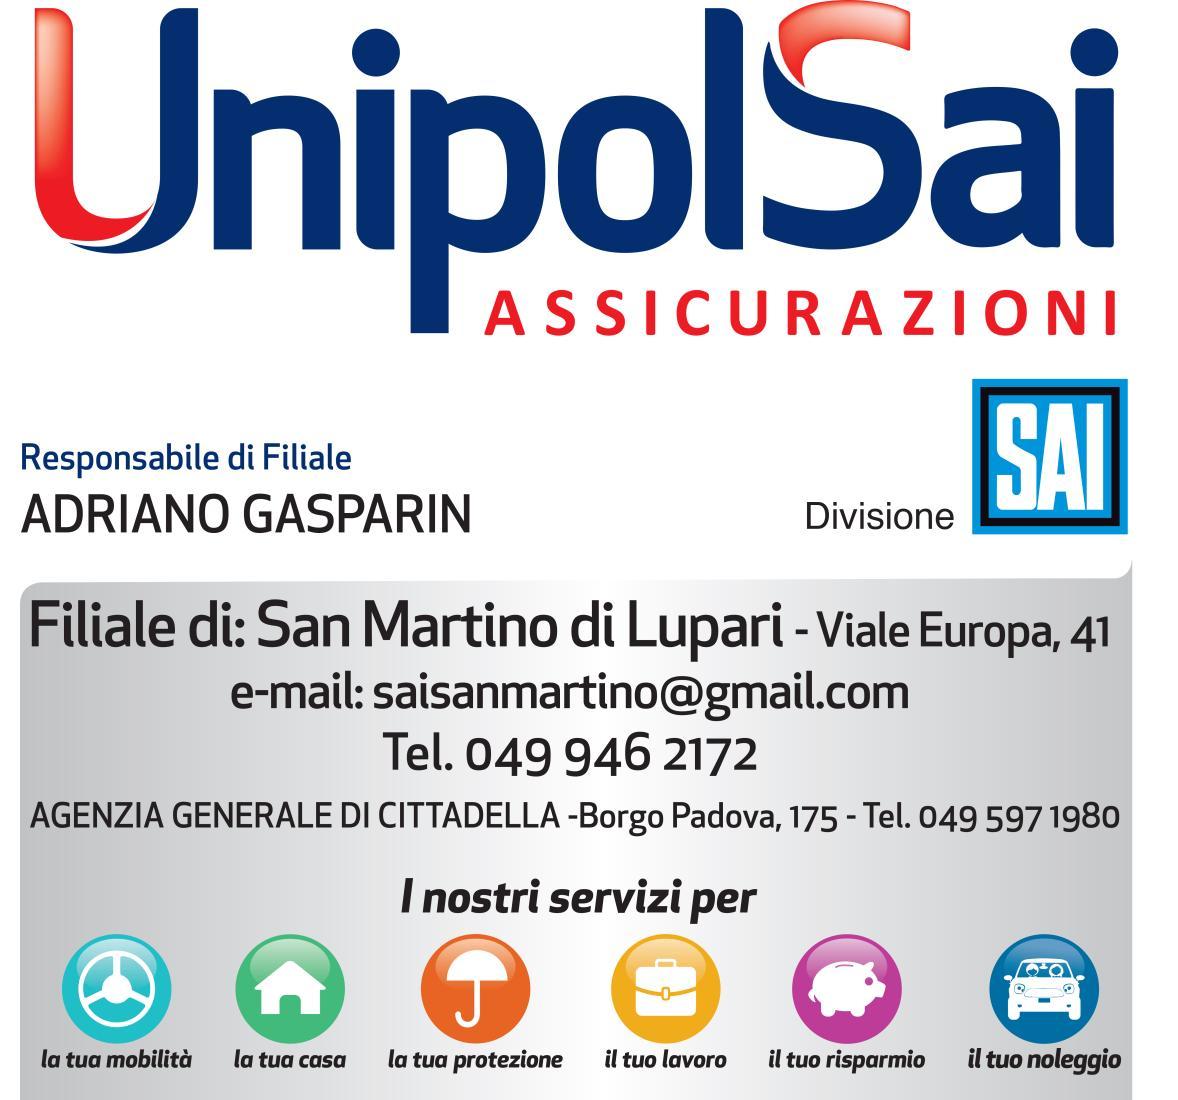 UnipolSai2020